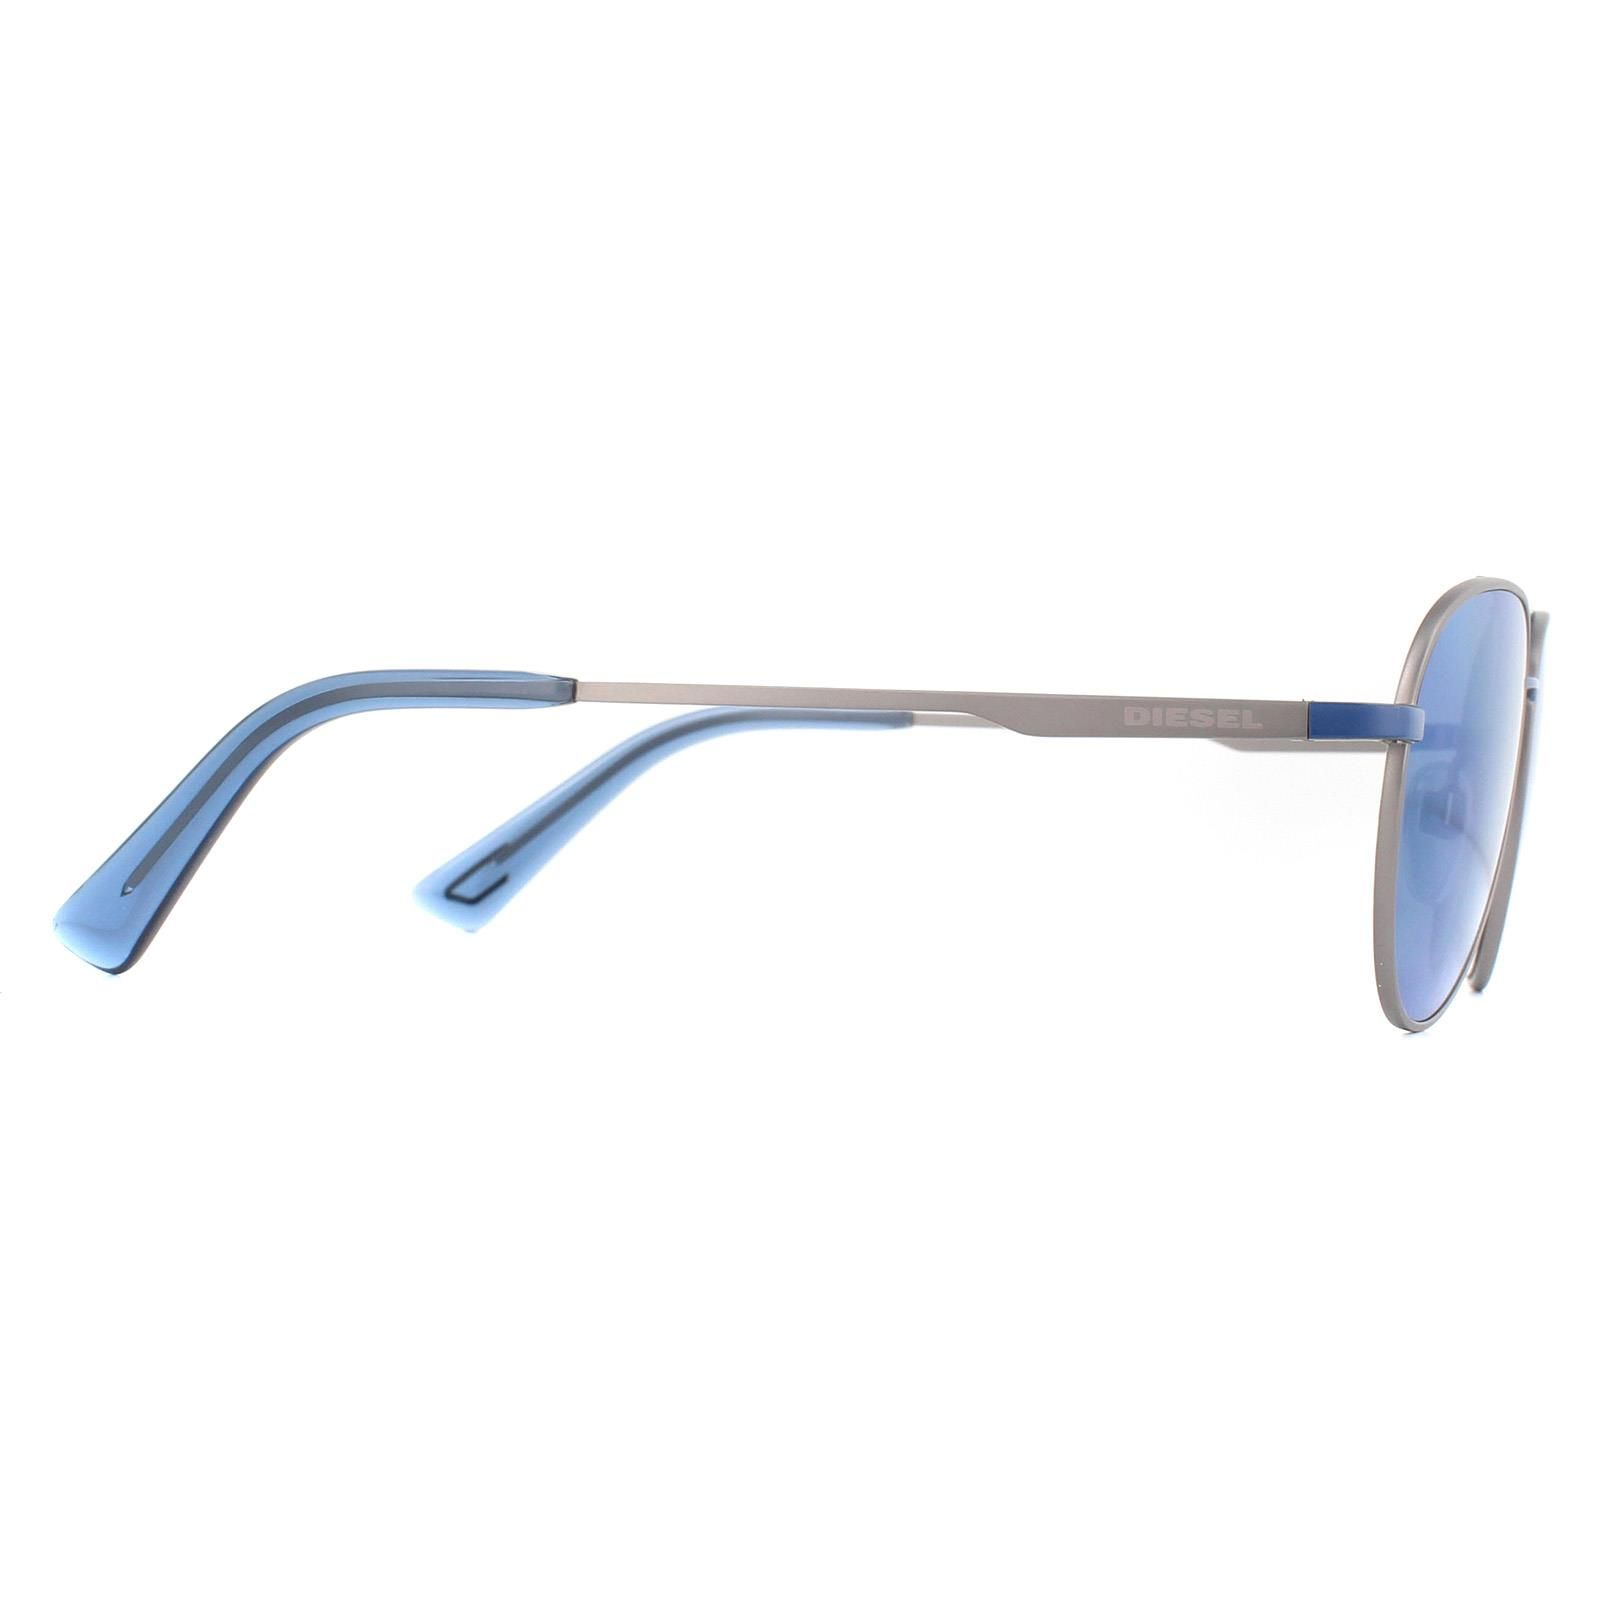 Diesel Sunglasses DL0291 92X Blue Grey Blue Mirror